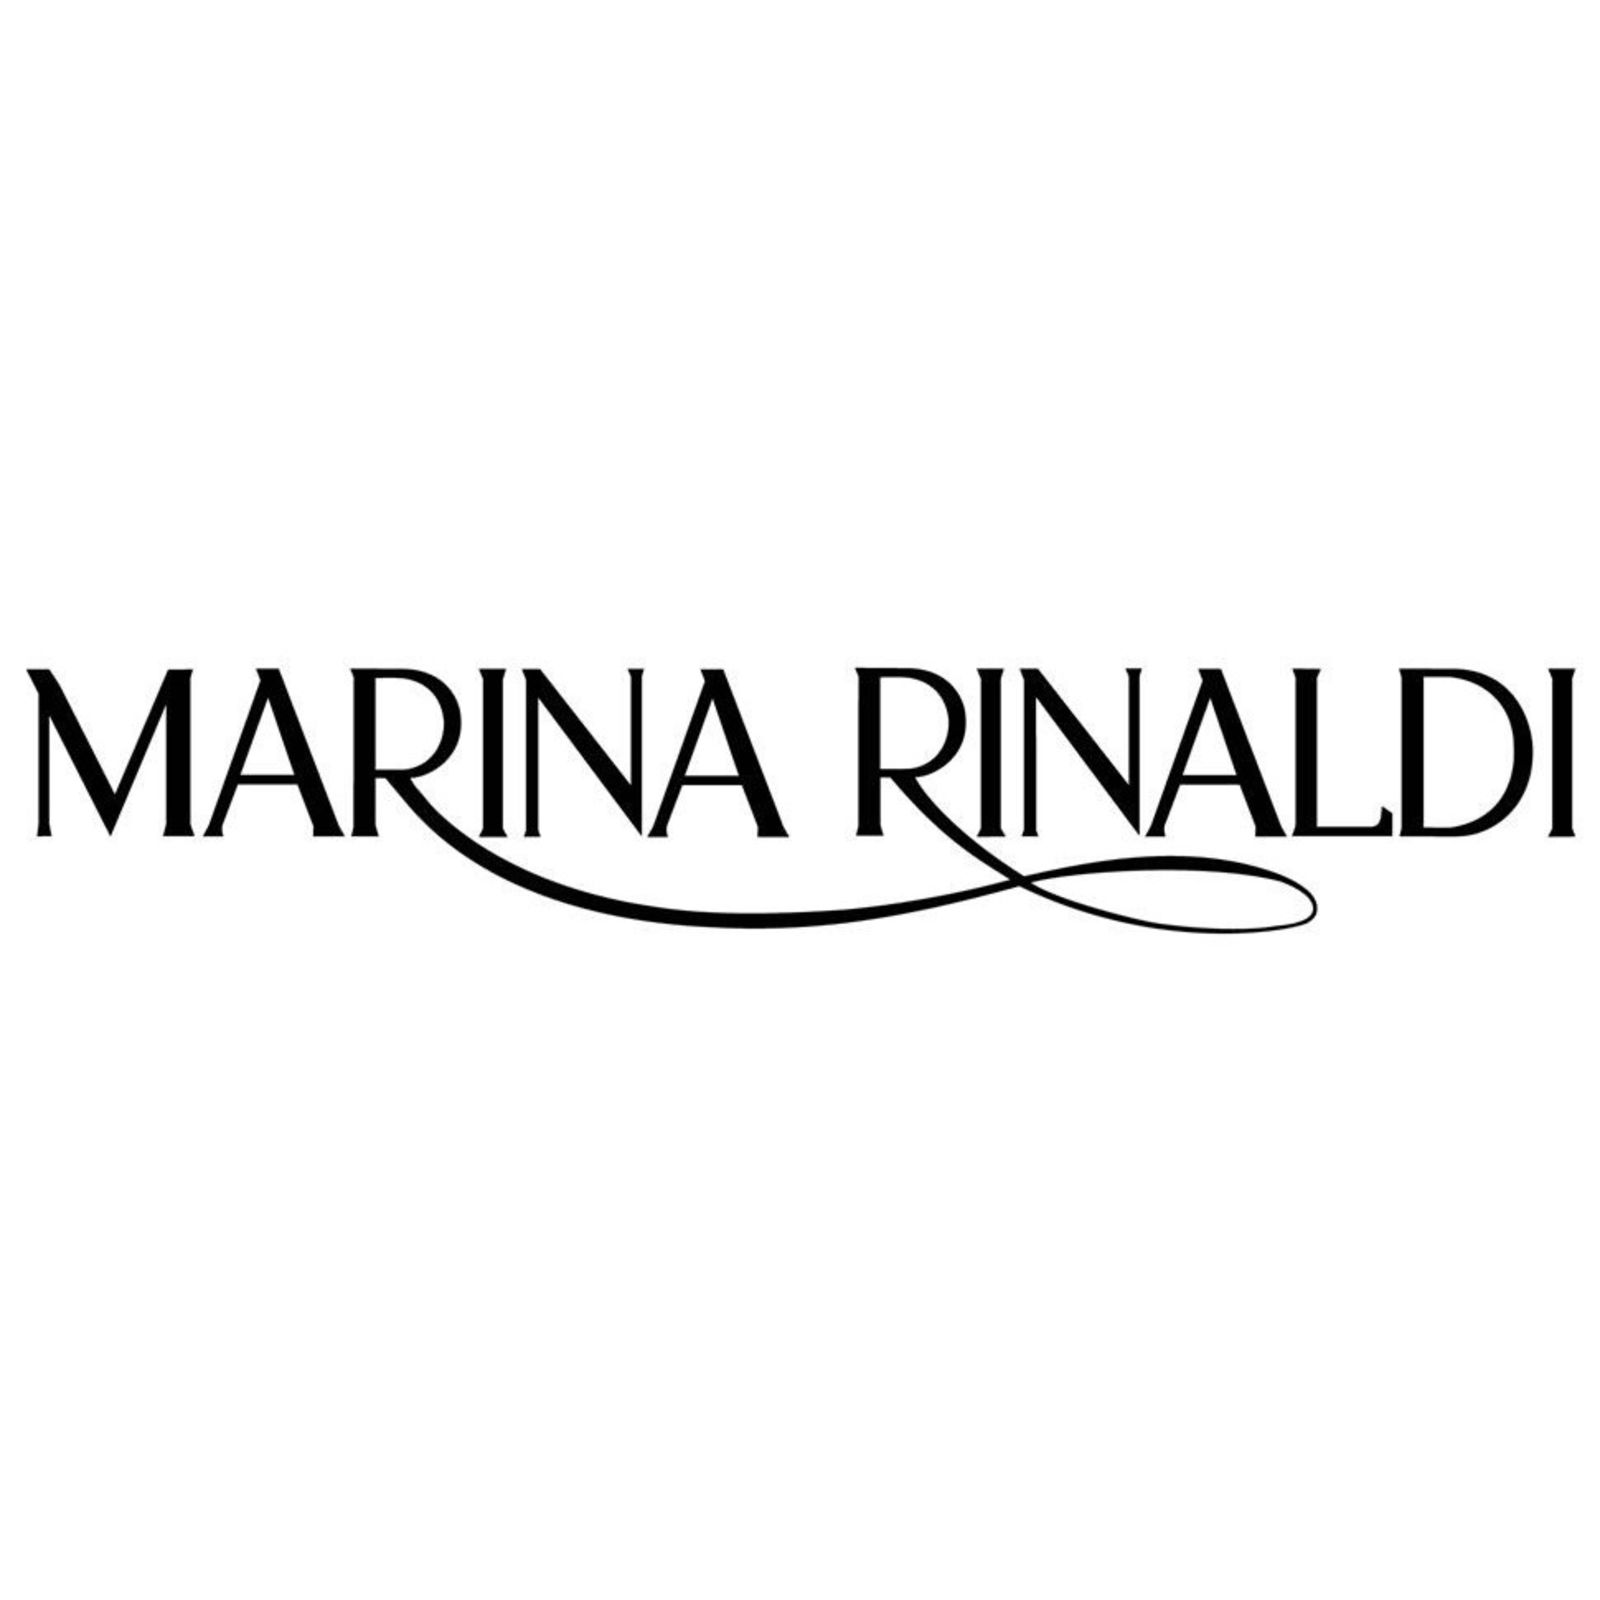 MARINA RINALDI (Bild 1)